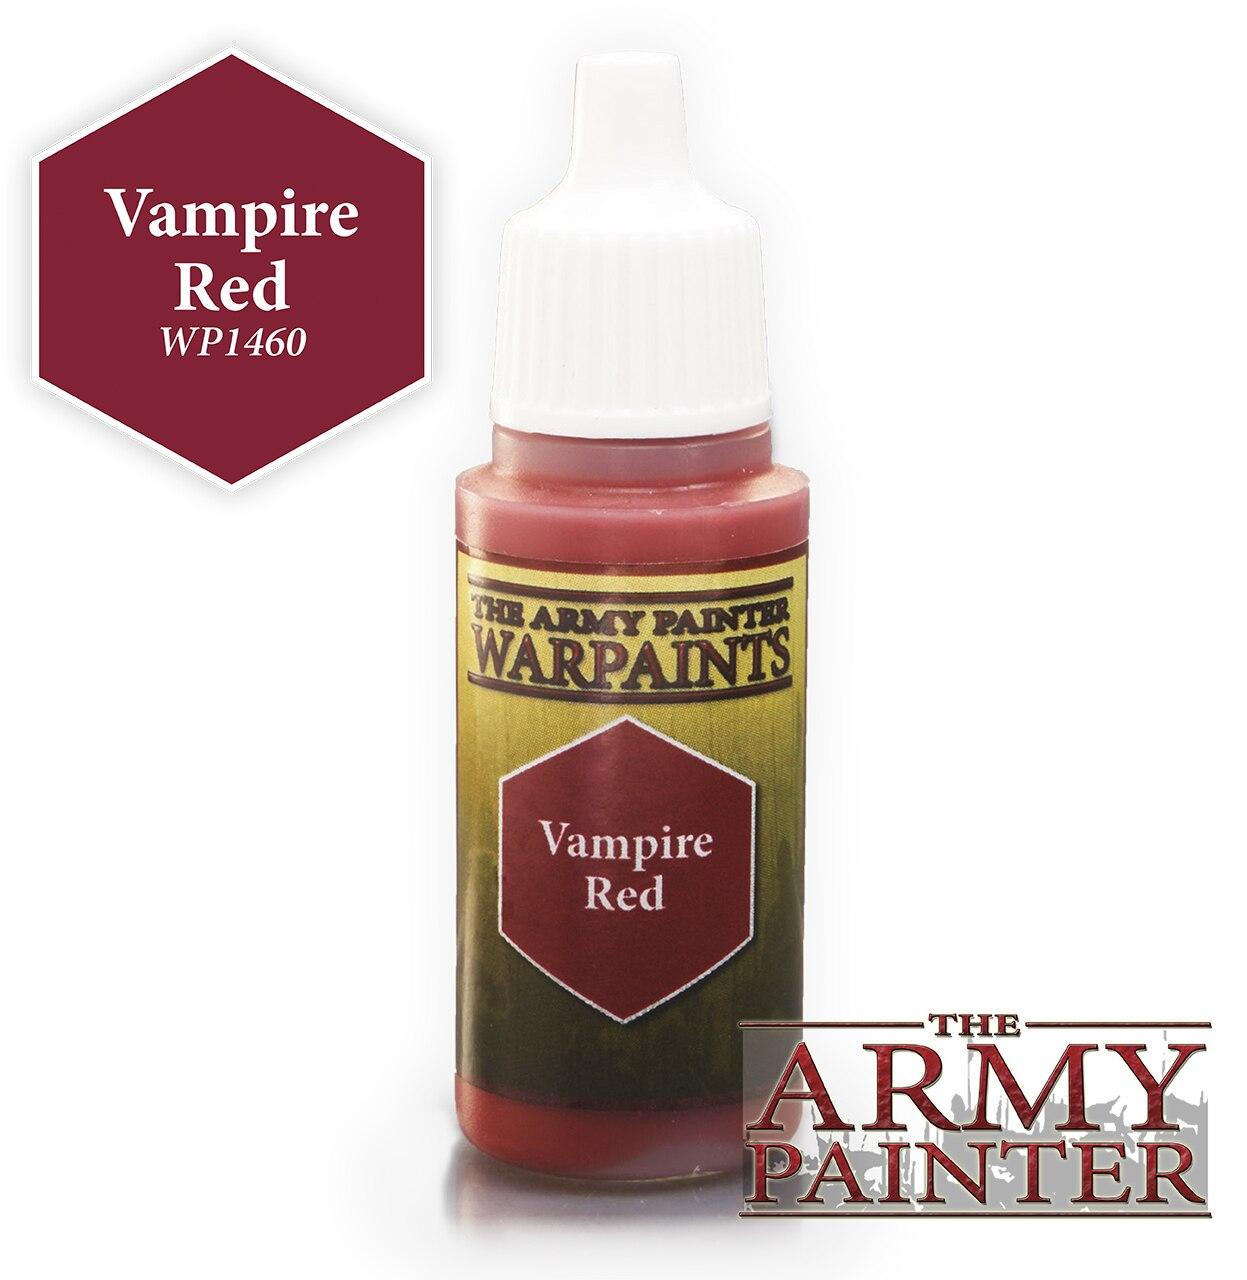 Army Painter Warpaint - Vampire Red